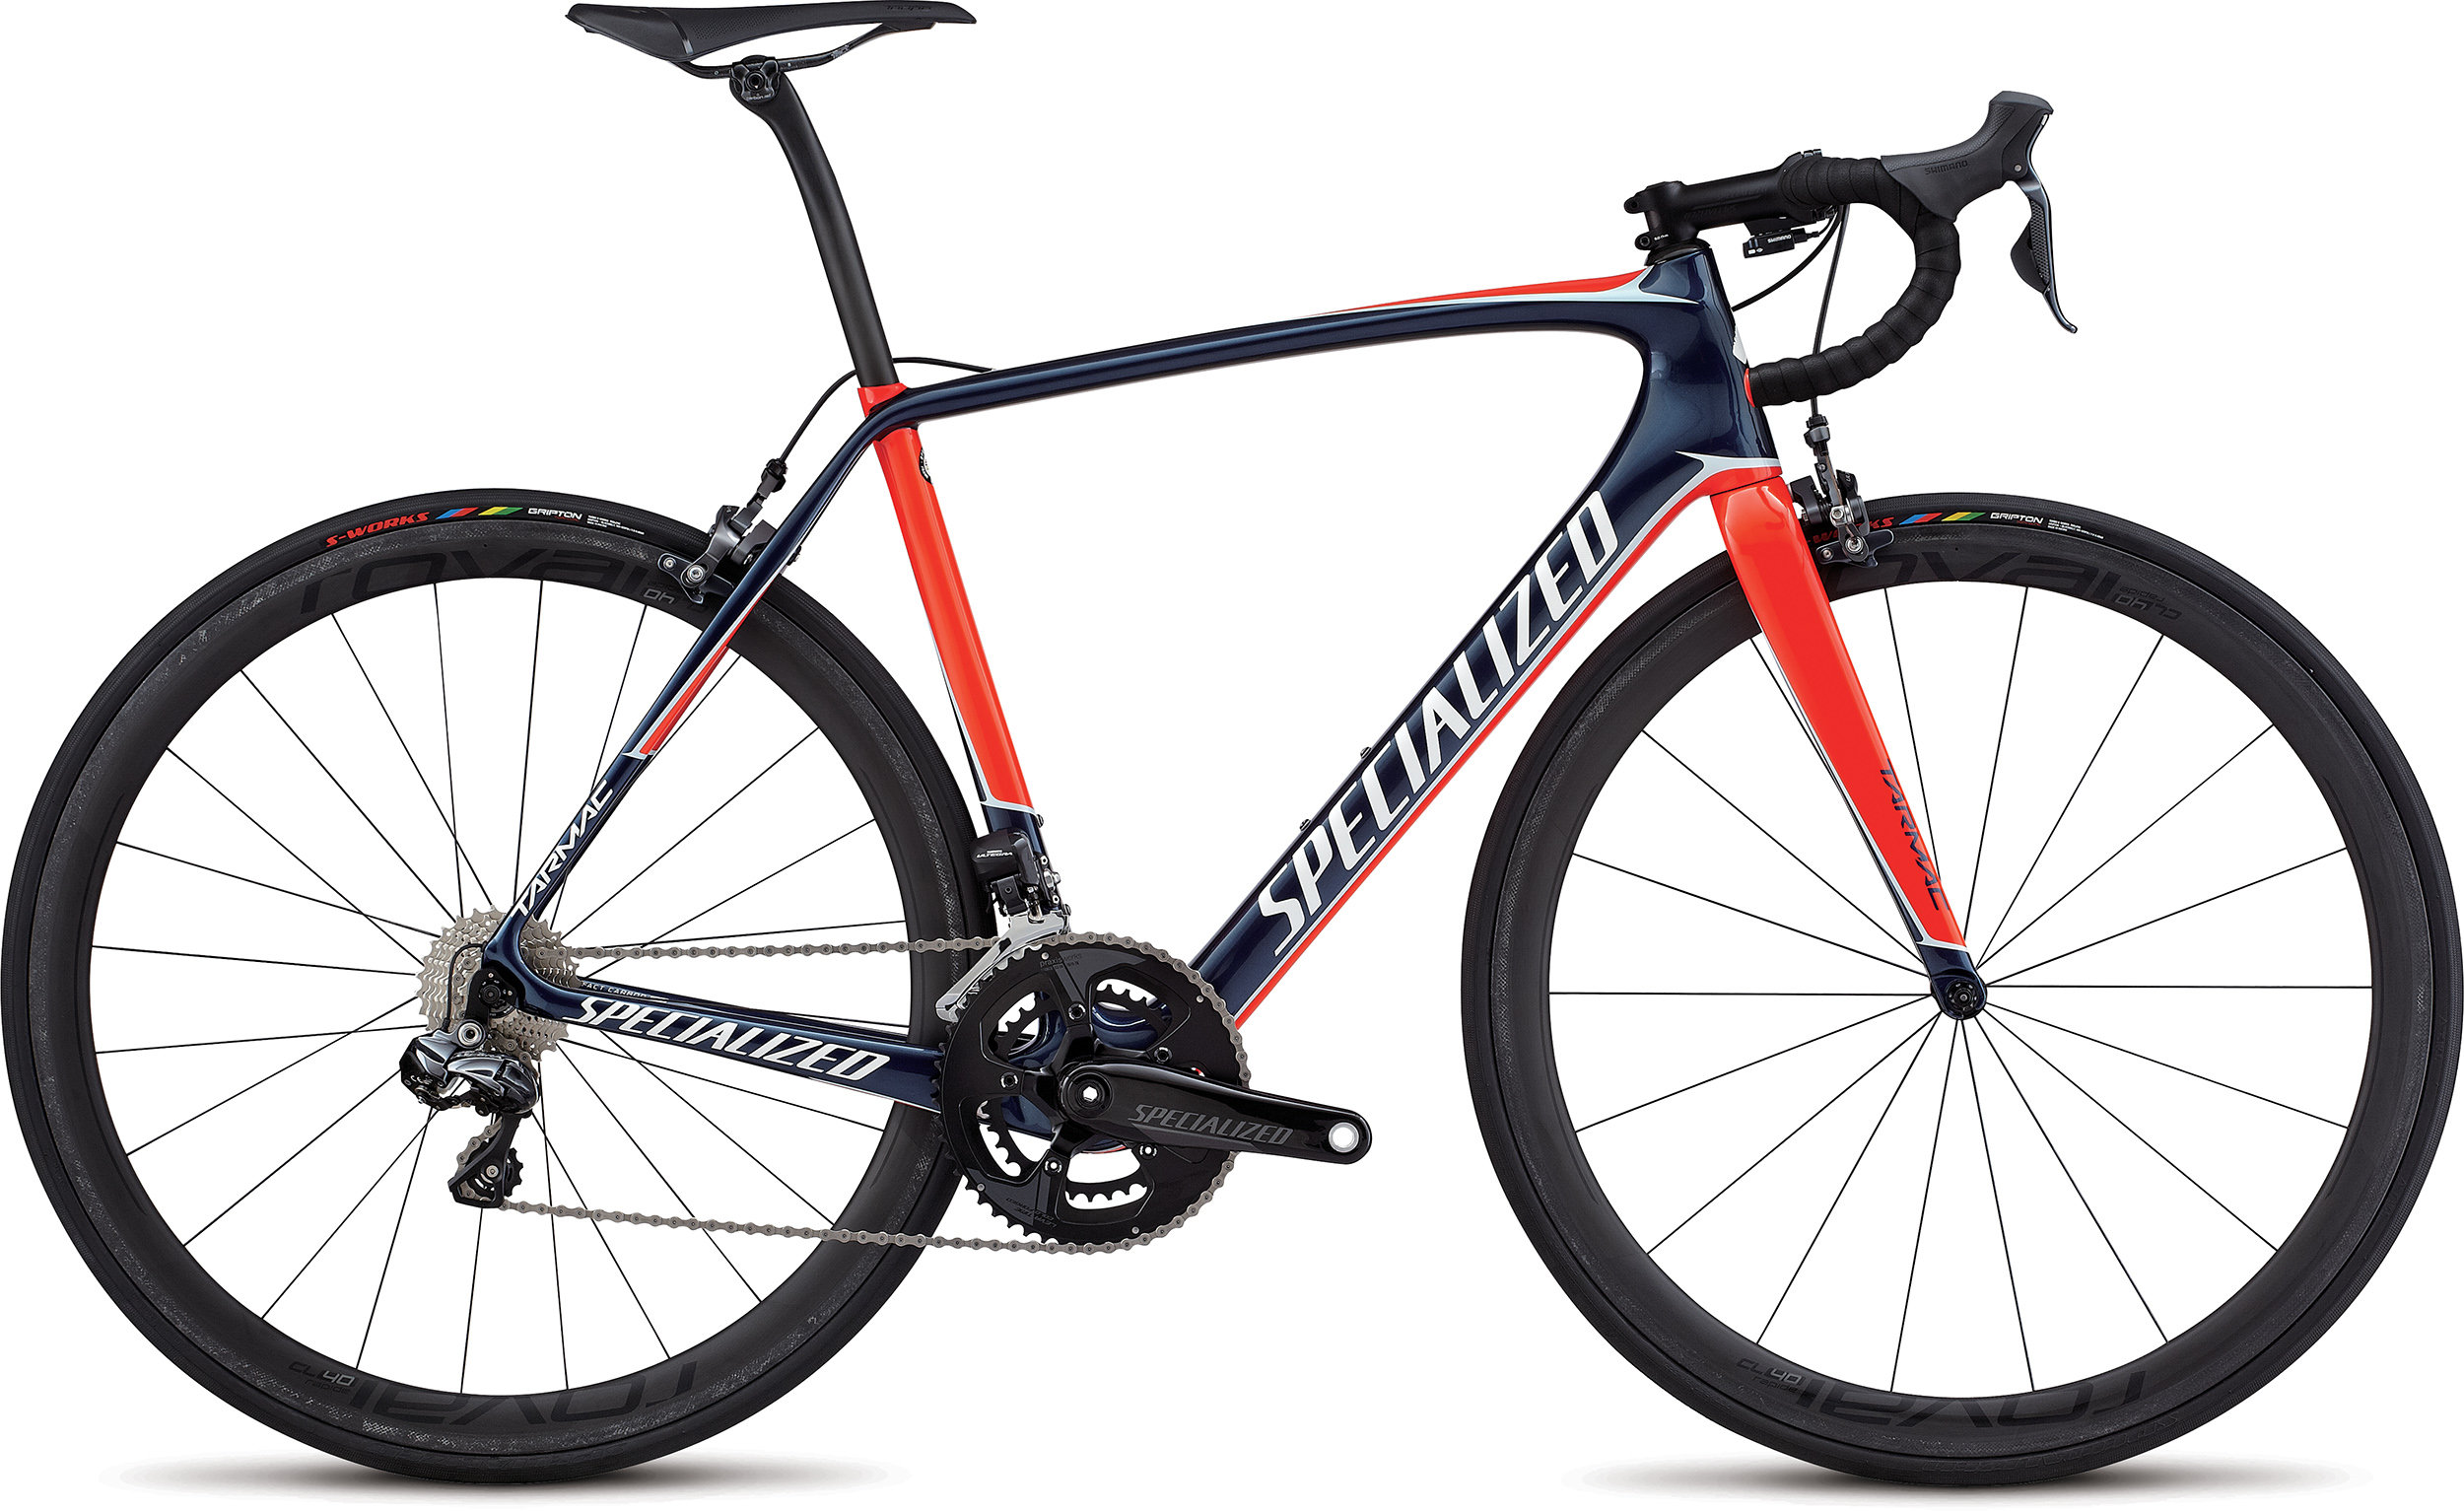 SPECIALIZED TARMAC PRO UDI2 NVY/BBYBLU/RKTRED 49 - Randen Bike GmbH